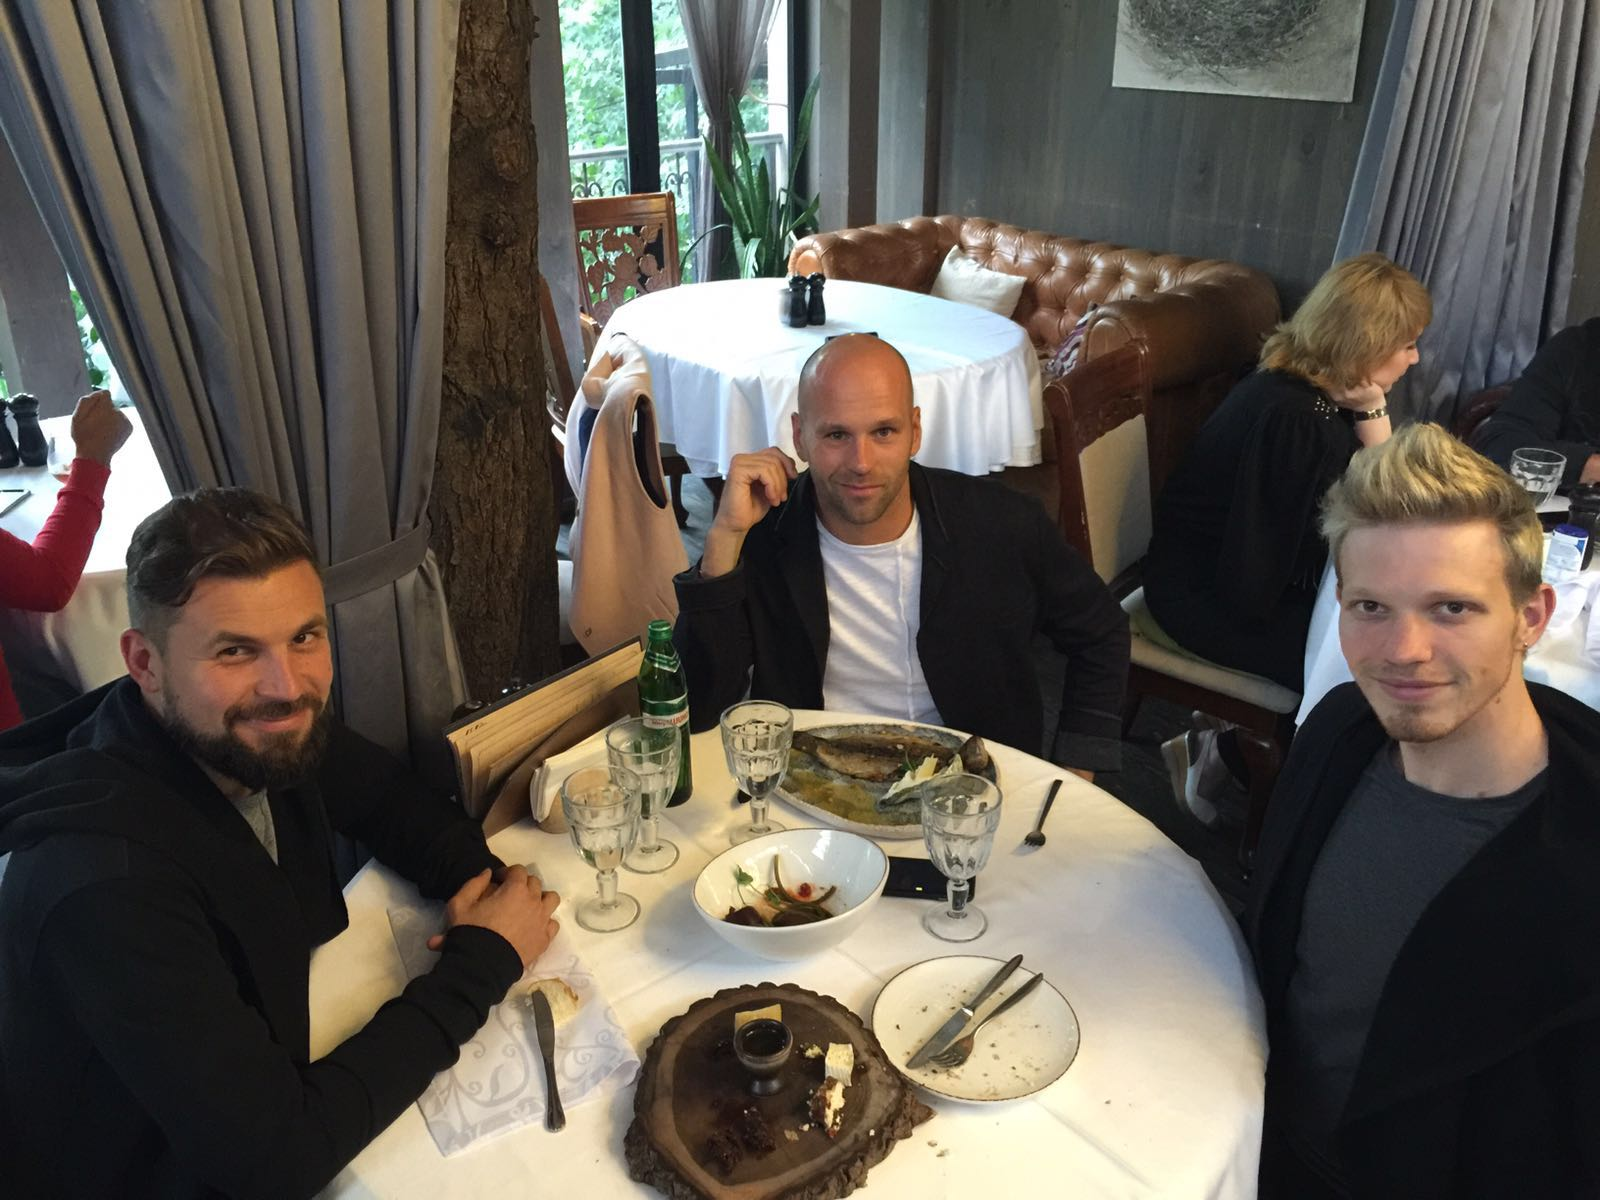 Peter Santenello, John Uke and their friend in Kyiv, Ukraine